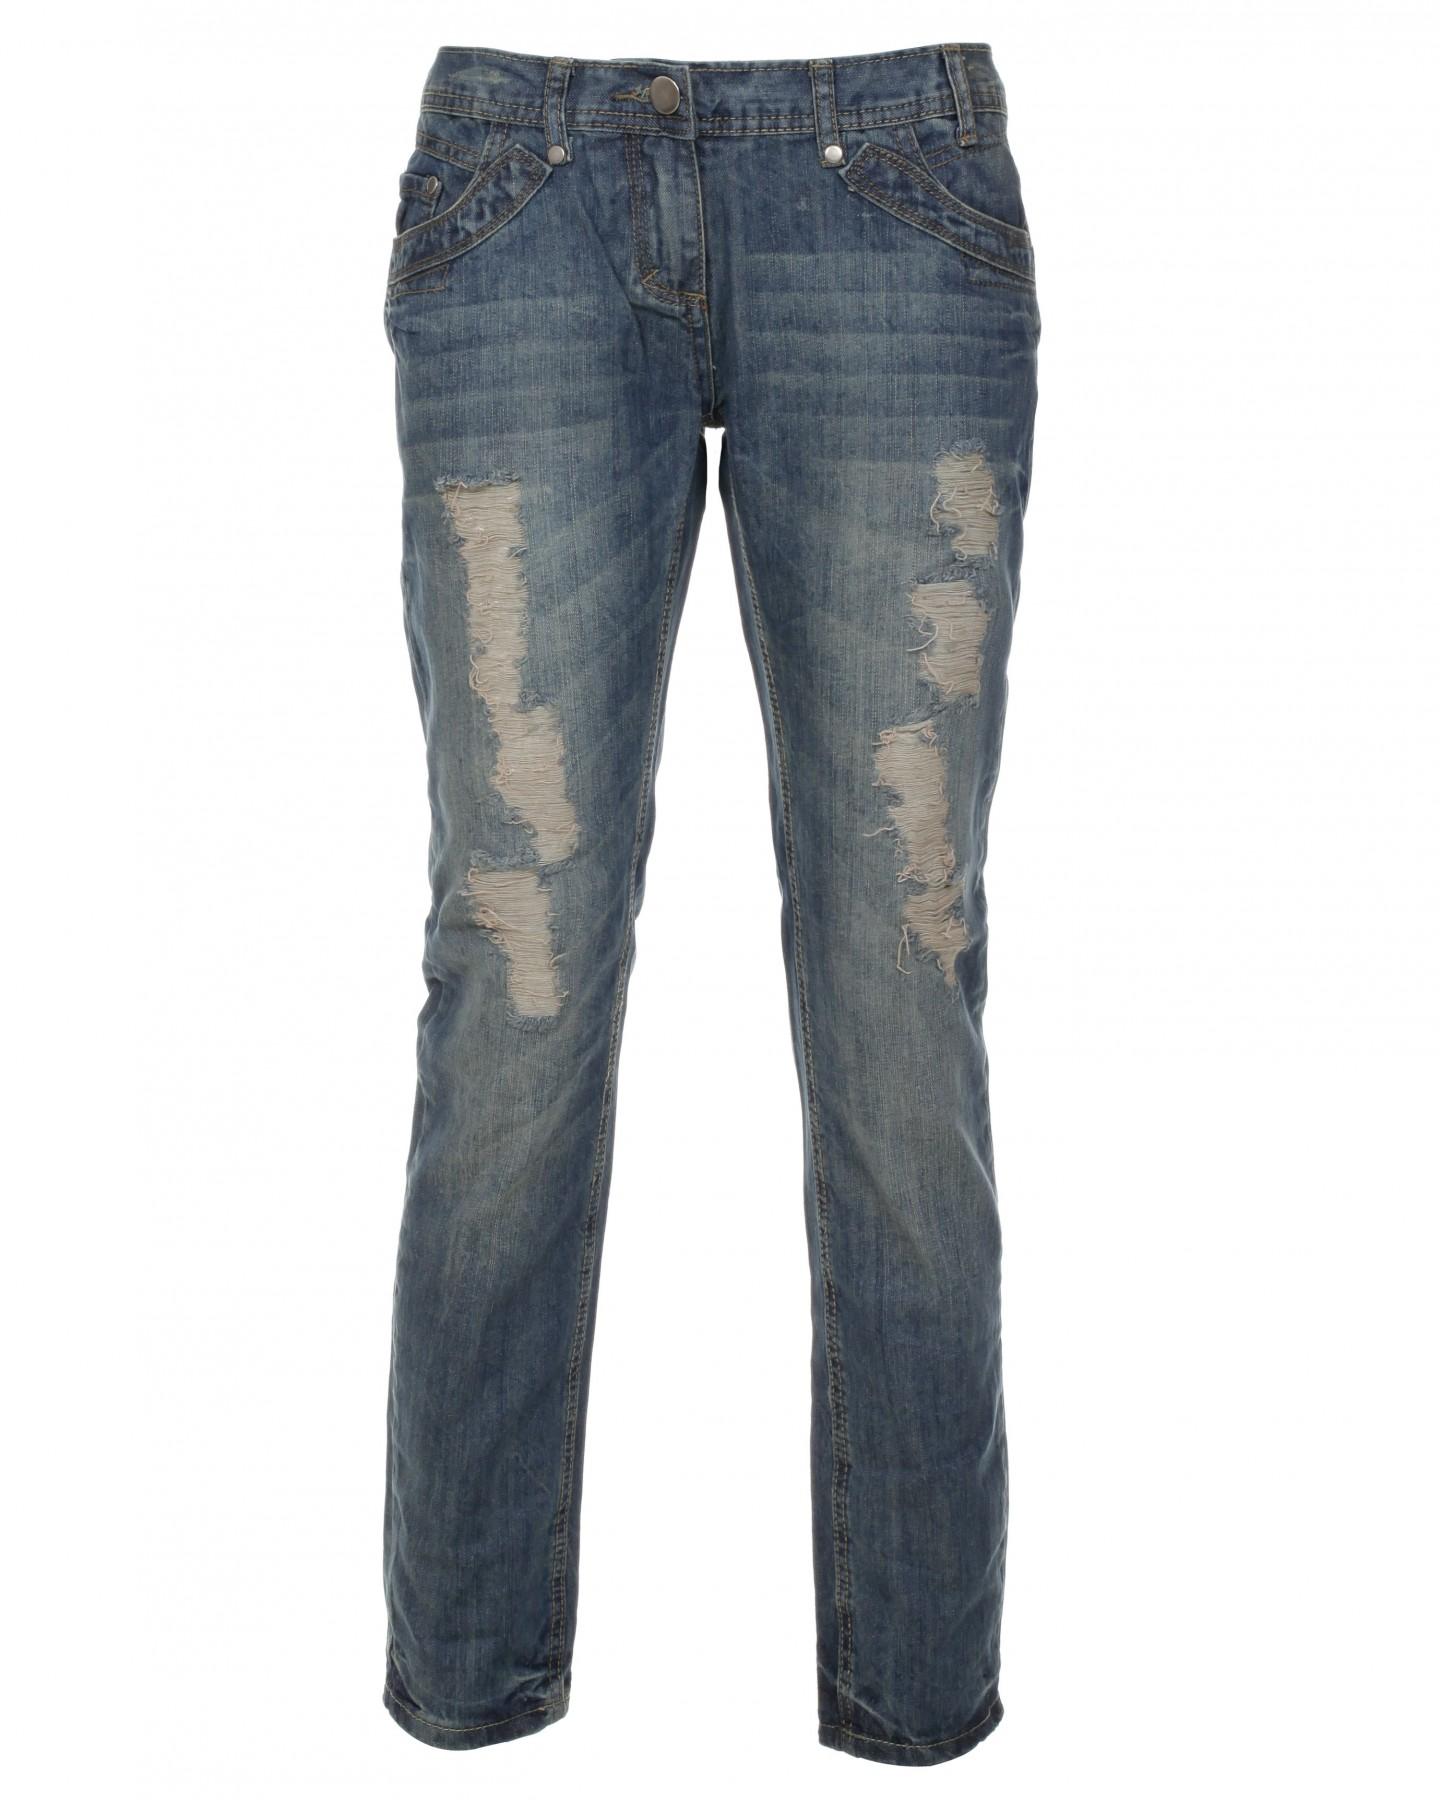 Blue Inc Womens Blue Ripped Denim Jeans   eBay